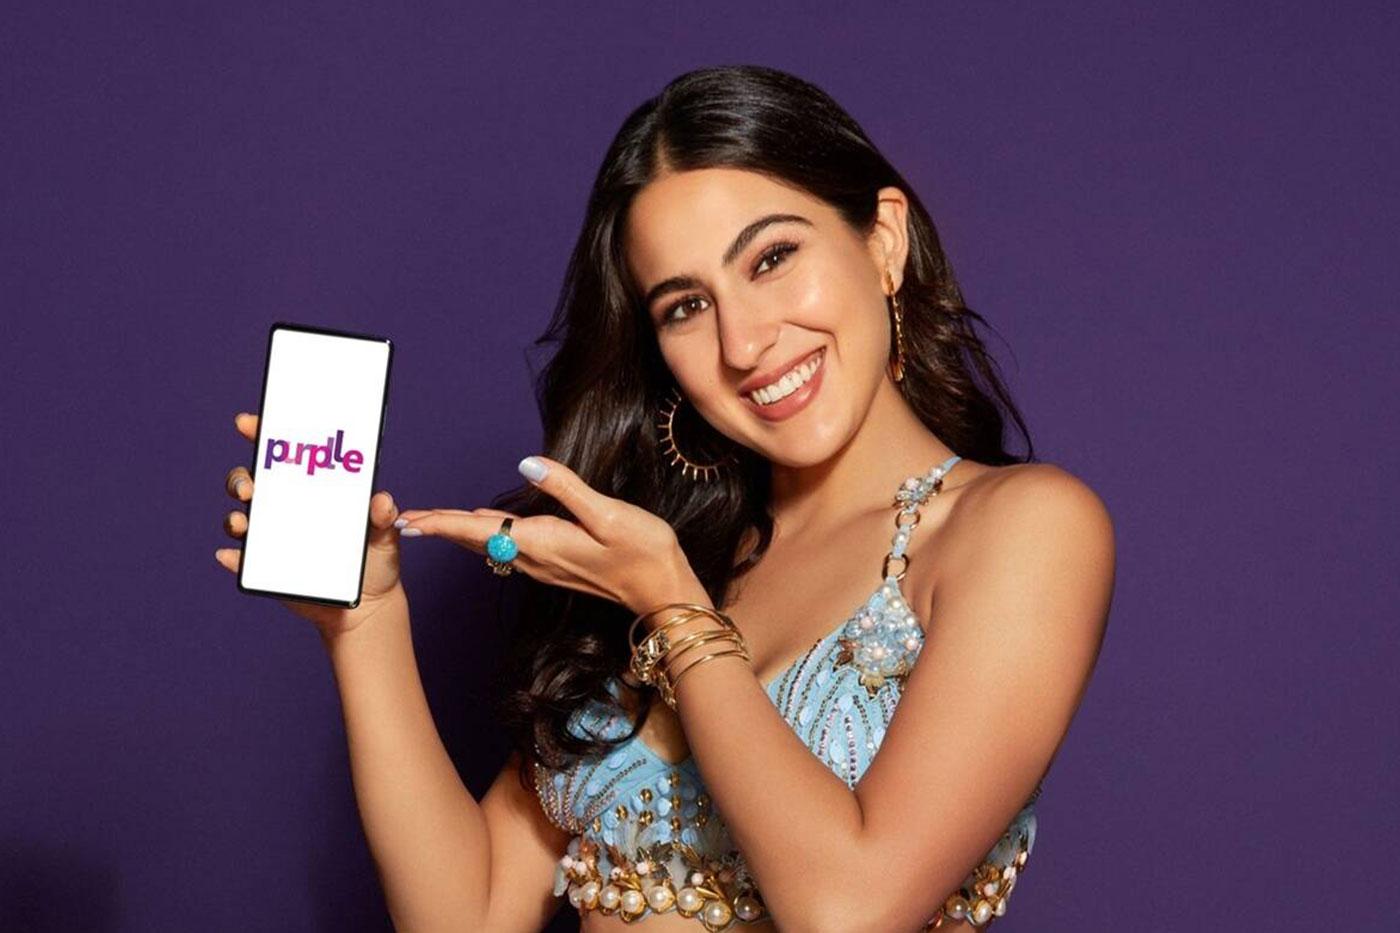 Purplle's Diwali campaign features Sara Ali Khan